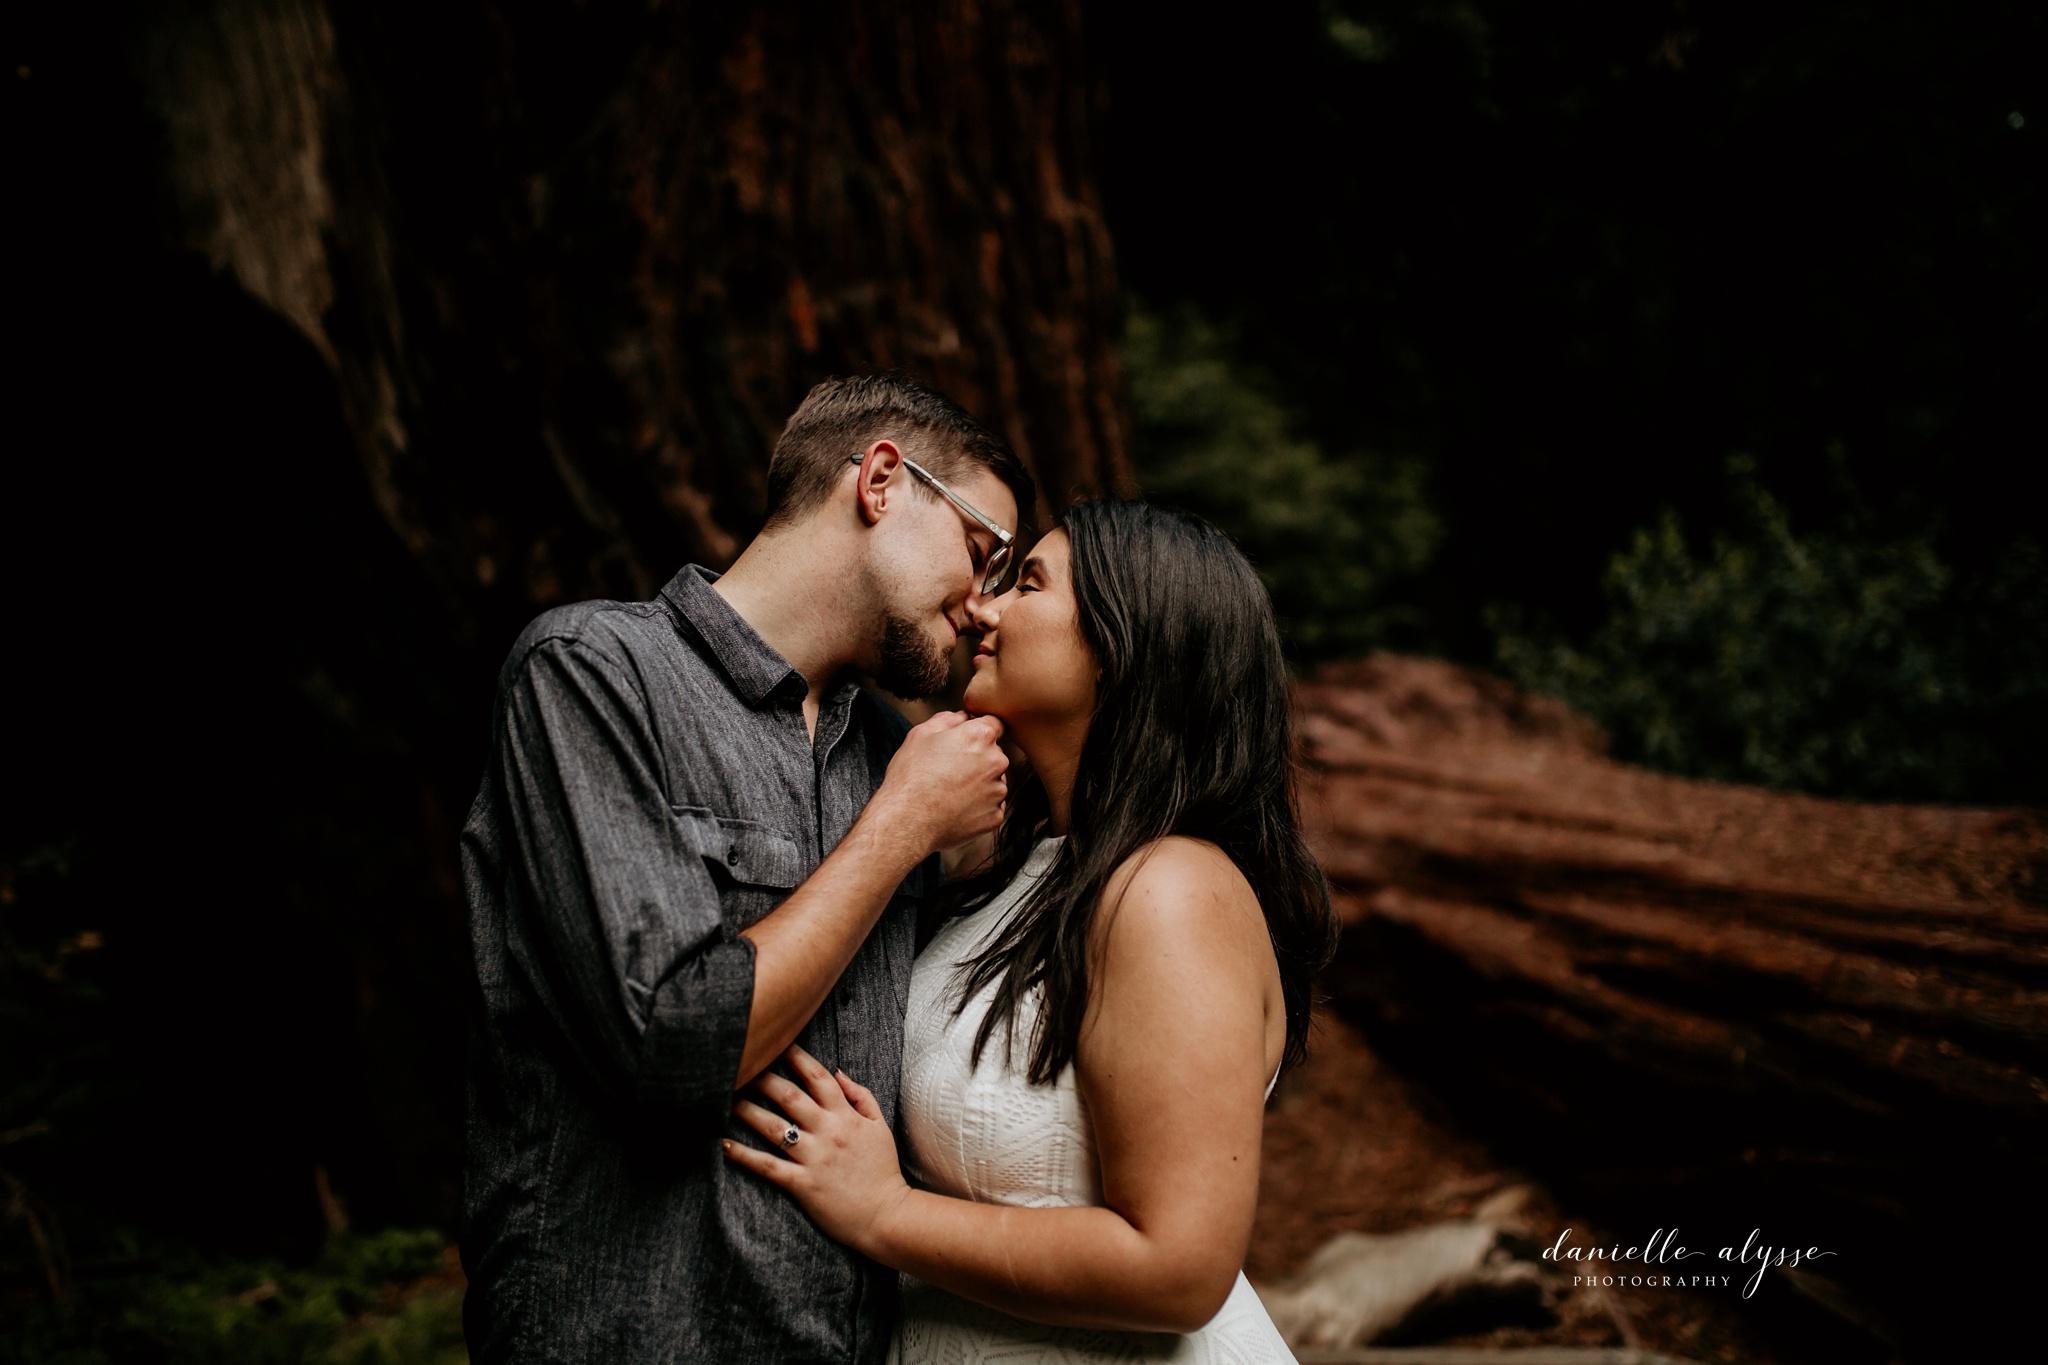 180503_engagement_bianca_muir_woods_mill_valley_danielle_alysse_photography_bay_area_photographer_blog_69_WEB.jpg